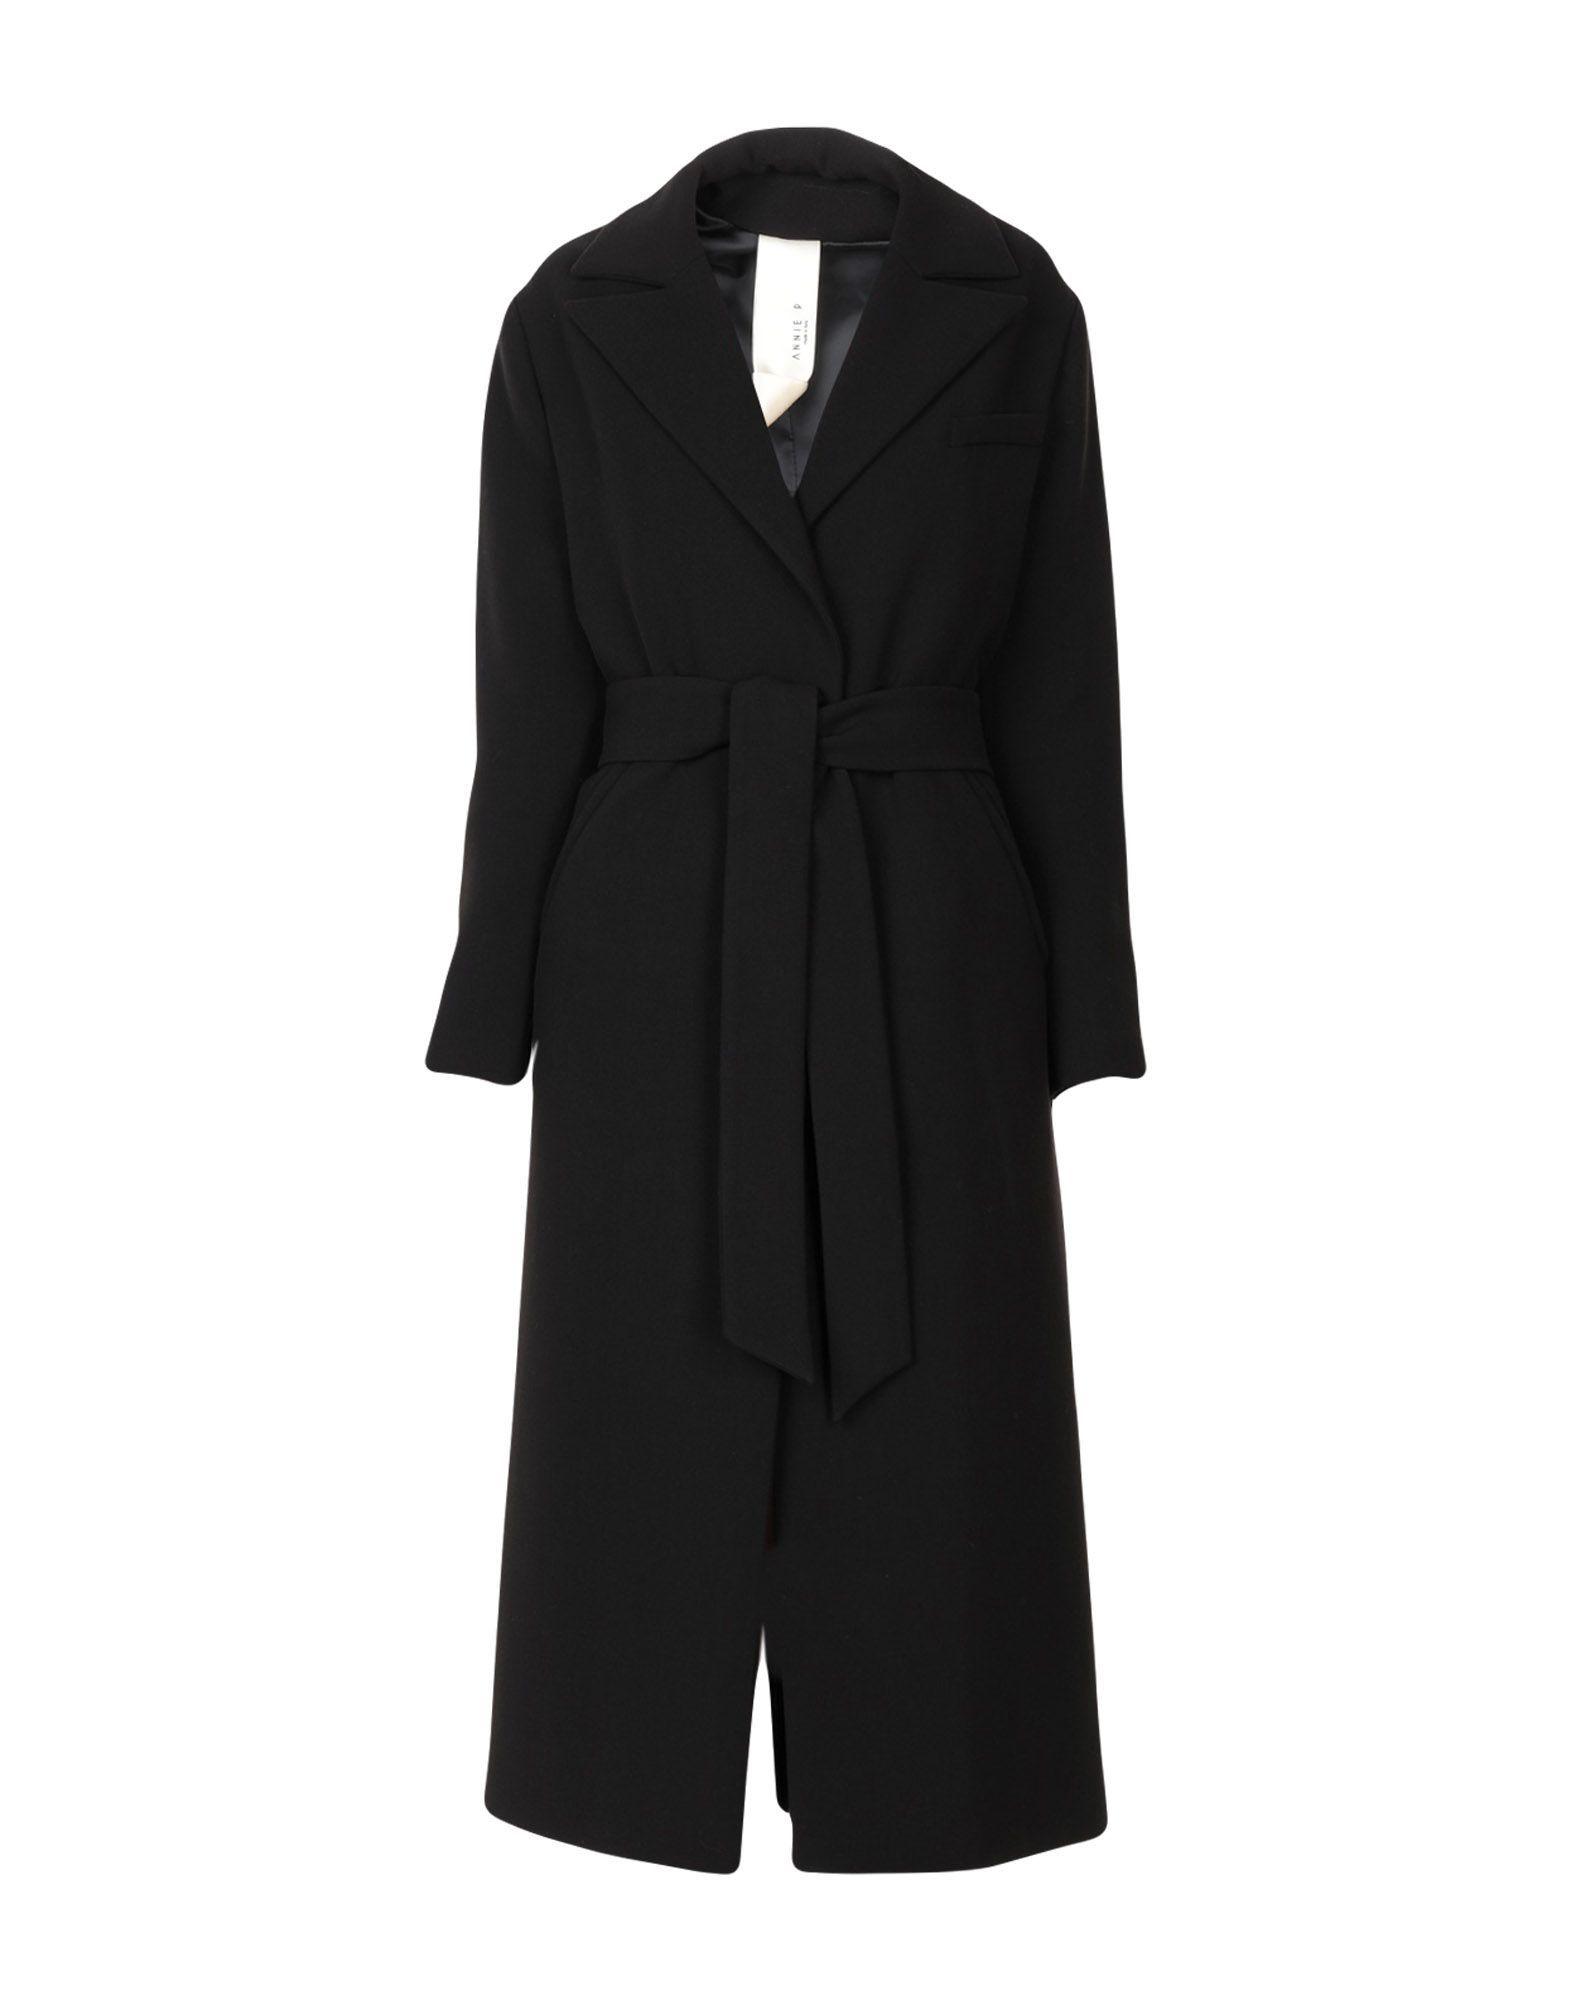 Coat & Jackets Annie P. Black Women's Wool